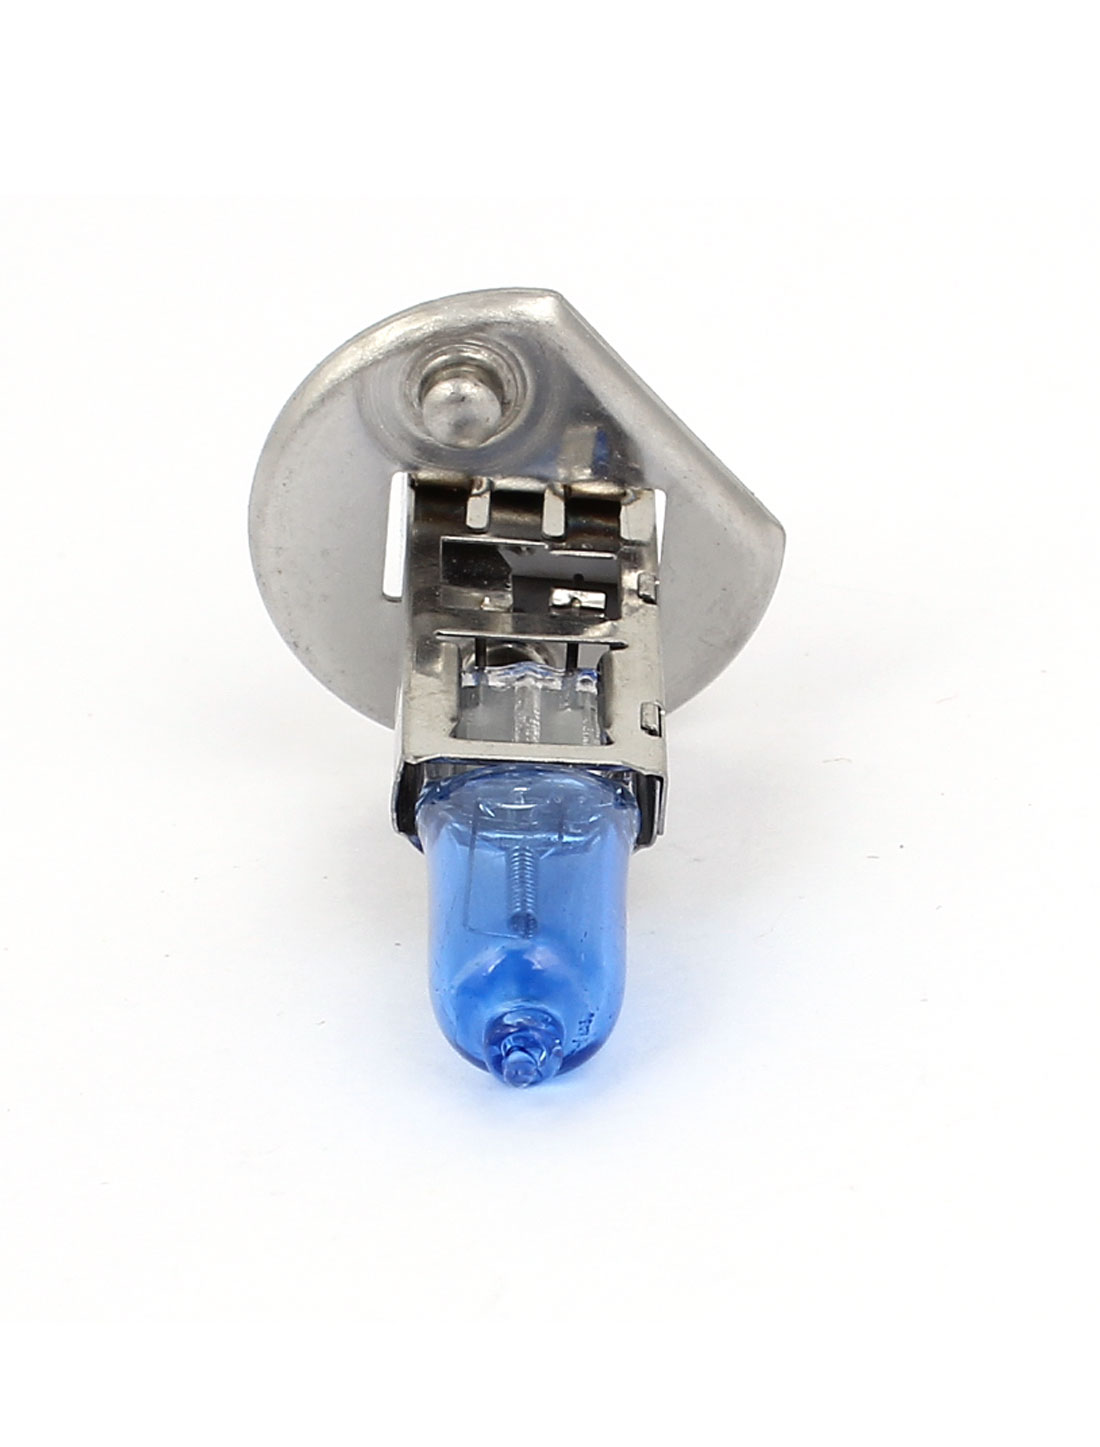 2pcs 12v 100w H1 Super Bright White Fog Halogen Bulb Car Head Light Lamp Ebay